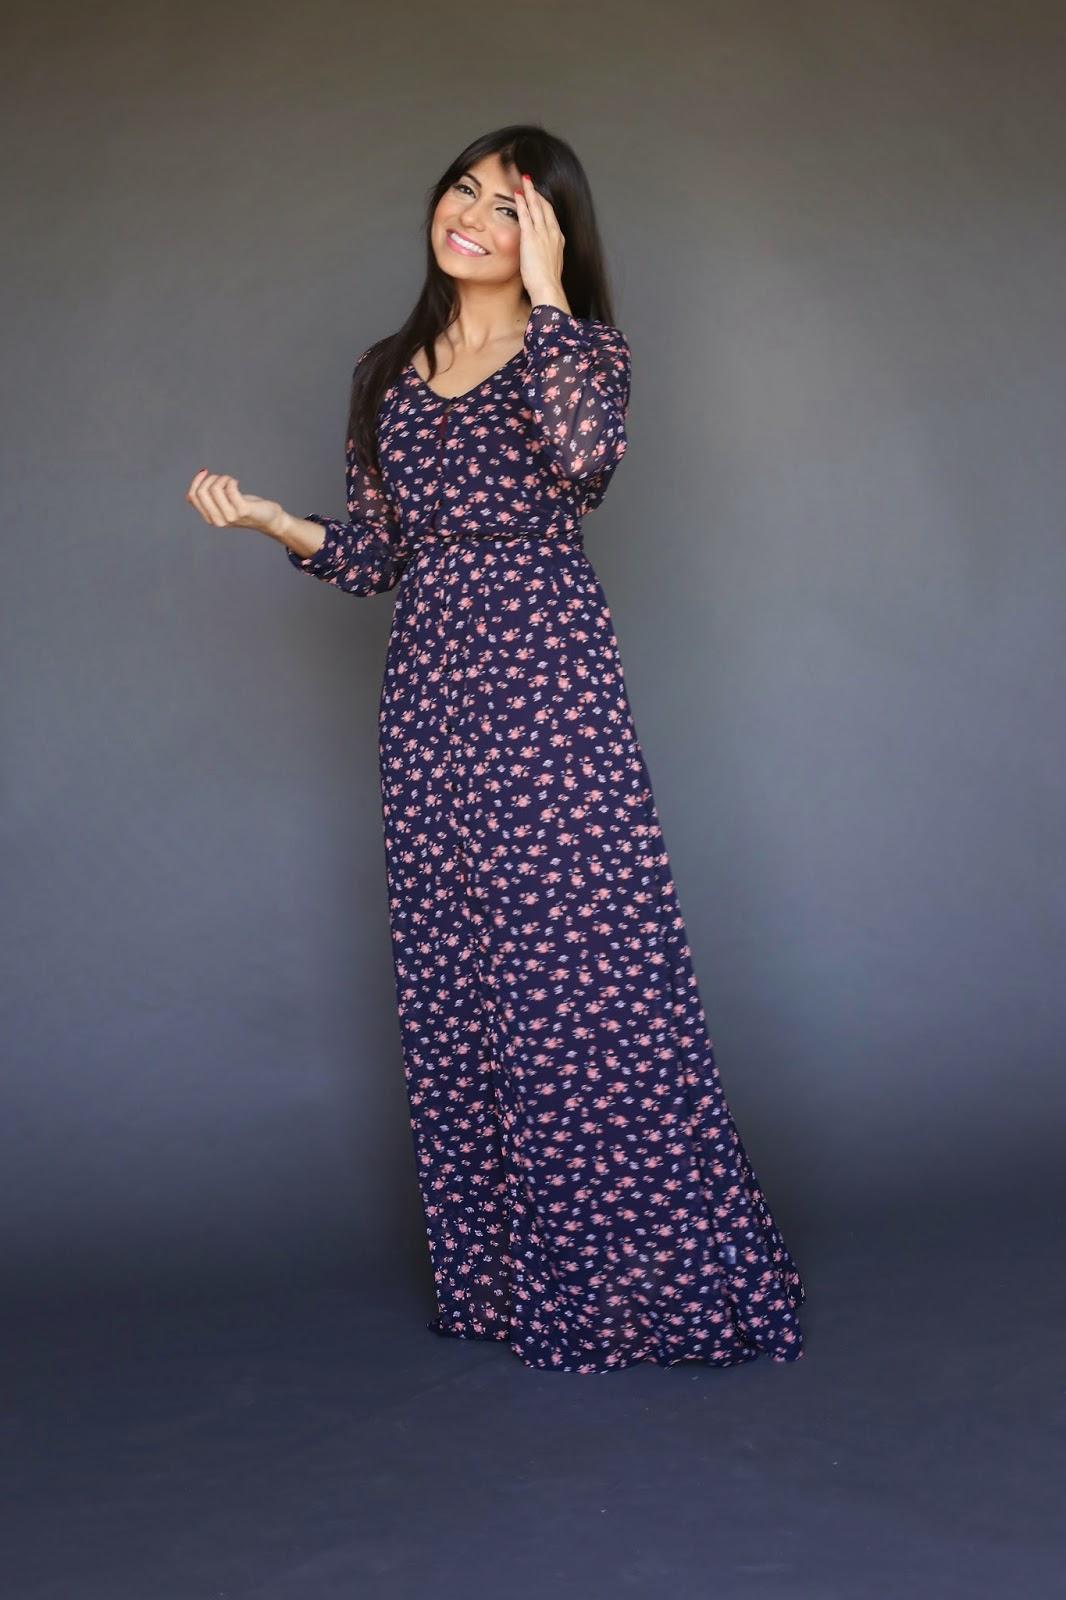 sheer long sleeve maxi dress with slip and small floral print Sophia Majeeb hijab tznius Mode-sty